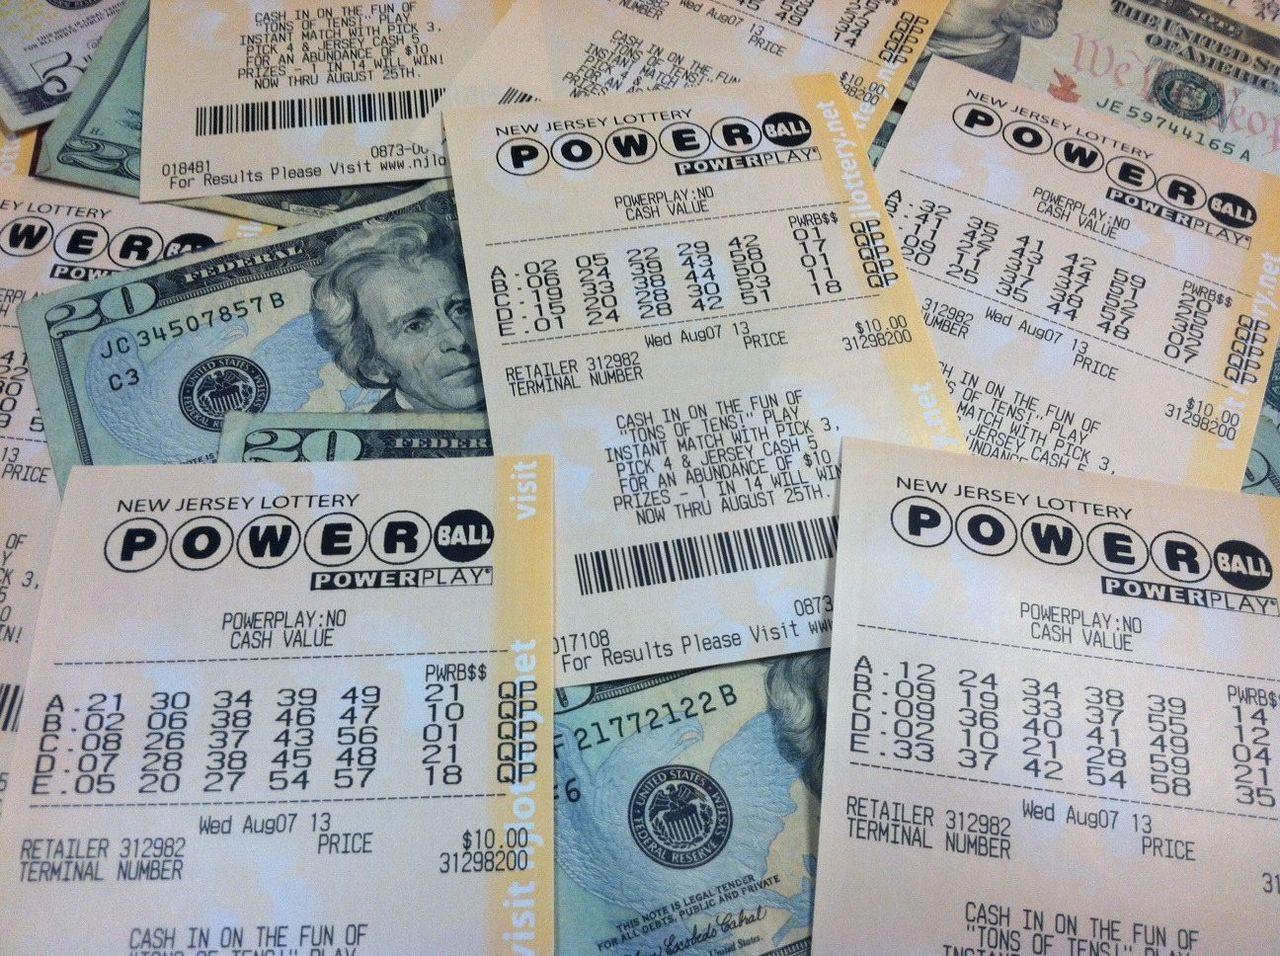 Nj lottery | 5 card cash 5 card cash